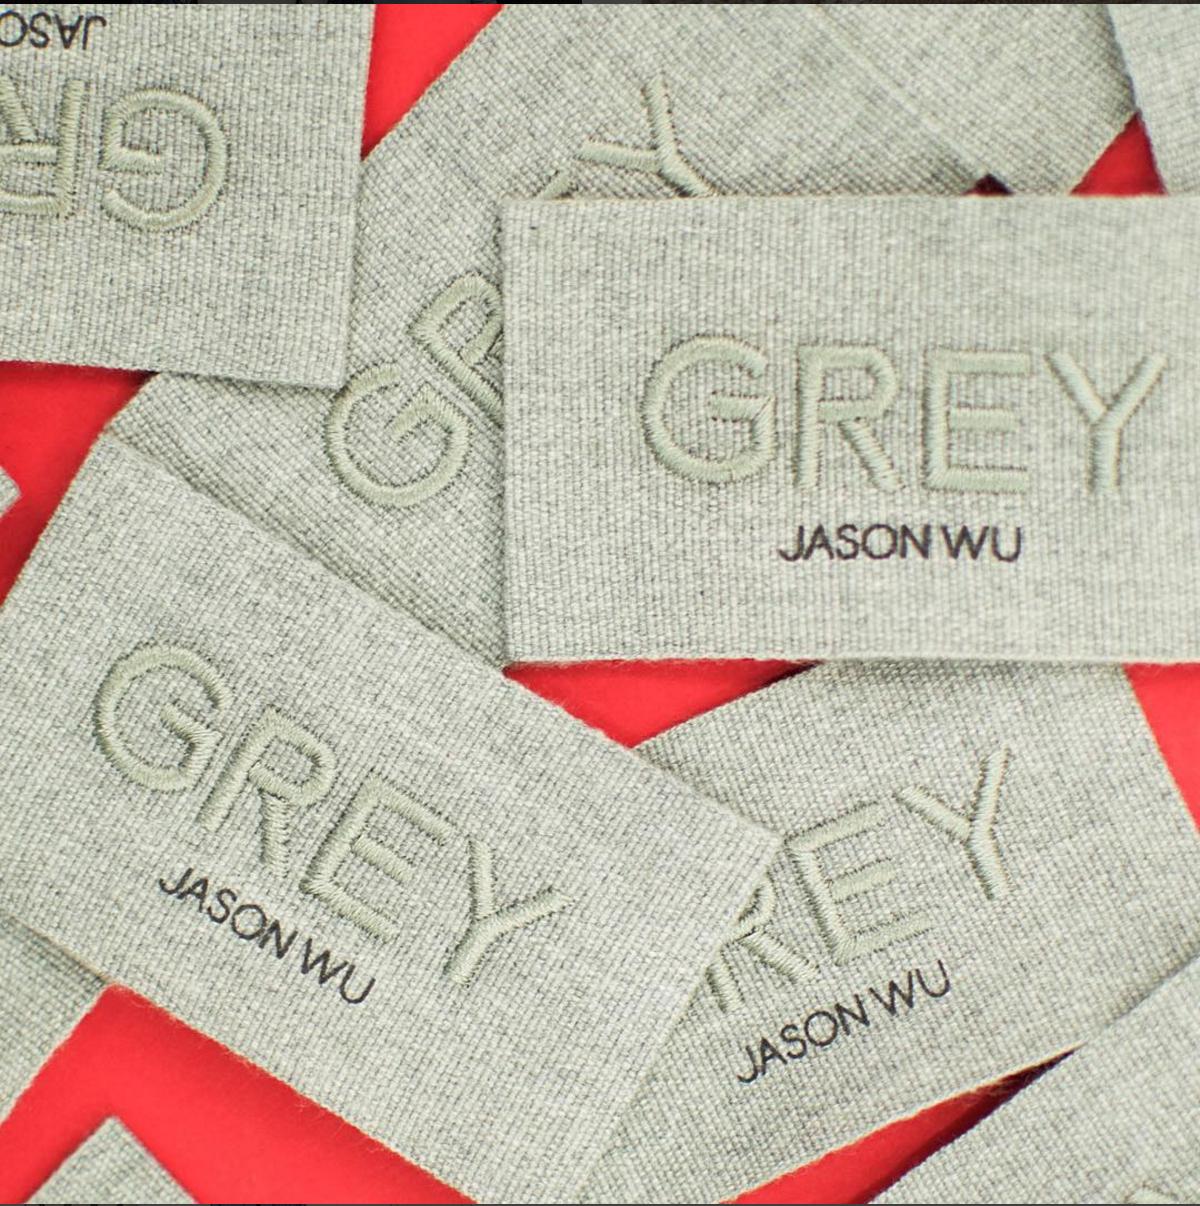 Instagram @GreyJasonWu